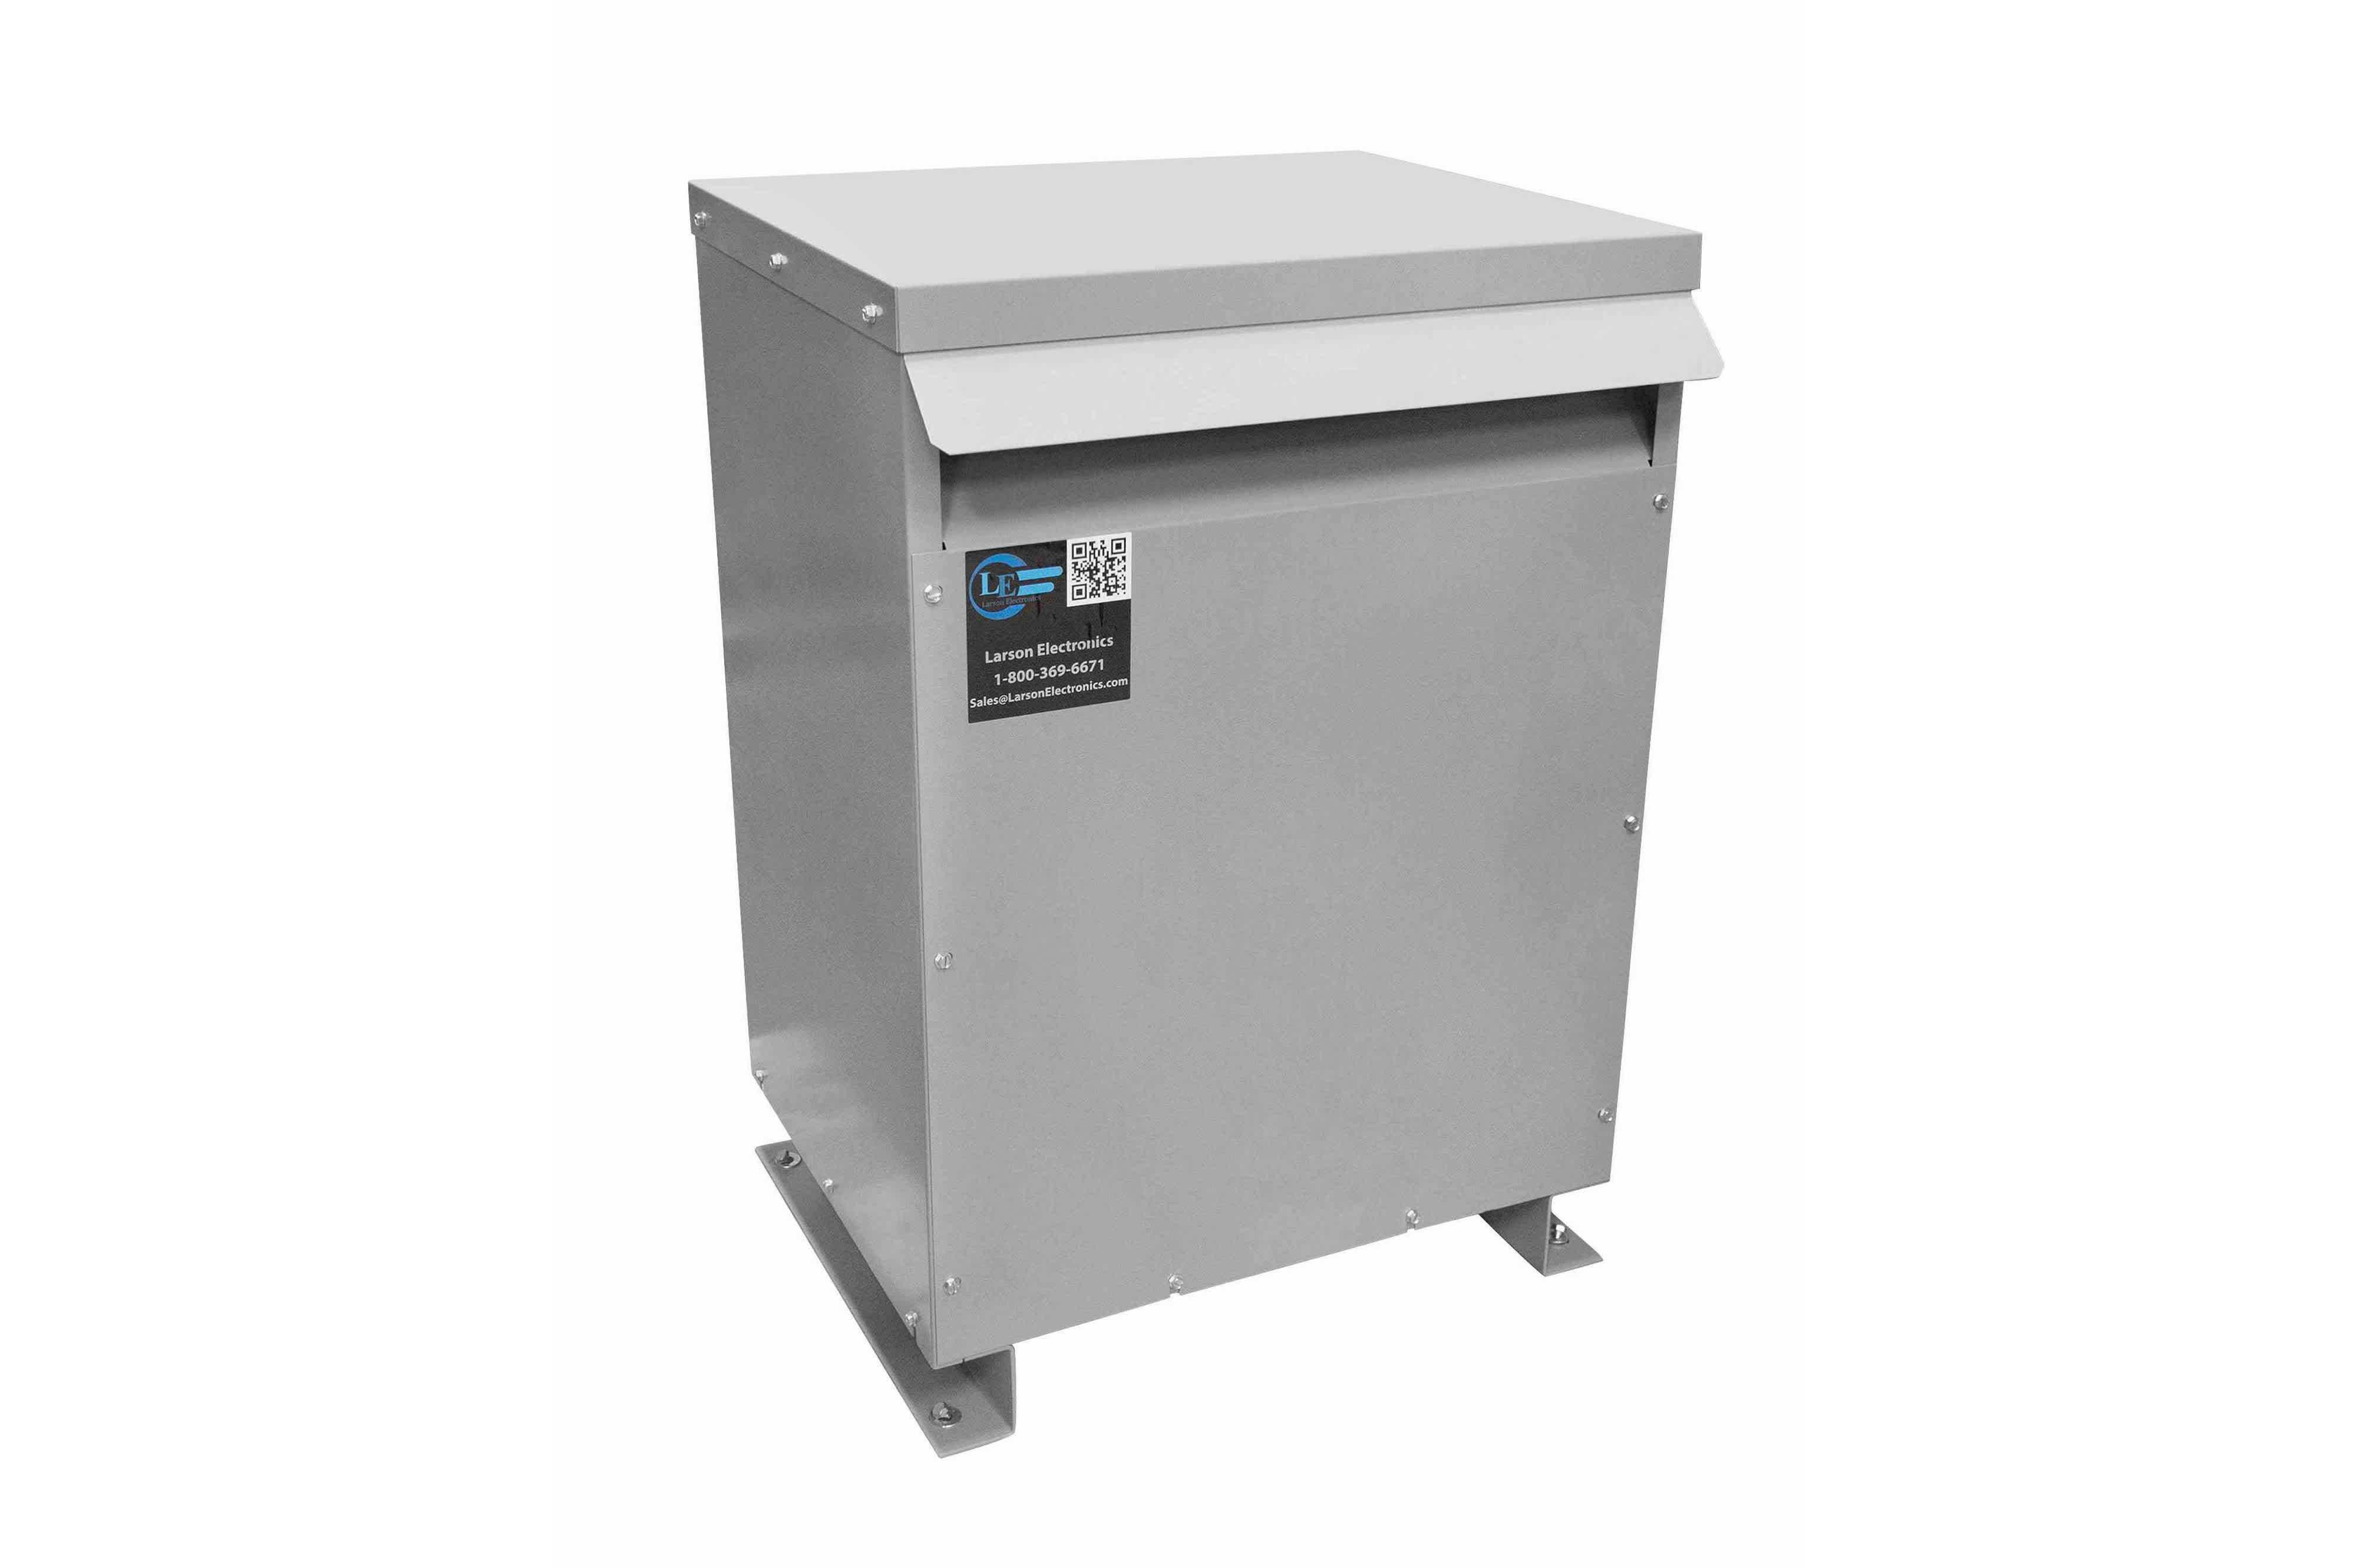 55 kVA 3PH Isolation Transformer, 440V Wye Primary, 240V Delta Secondary, N3R, Ventilated, 60 Hz